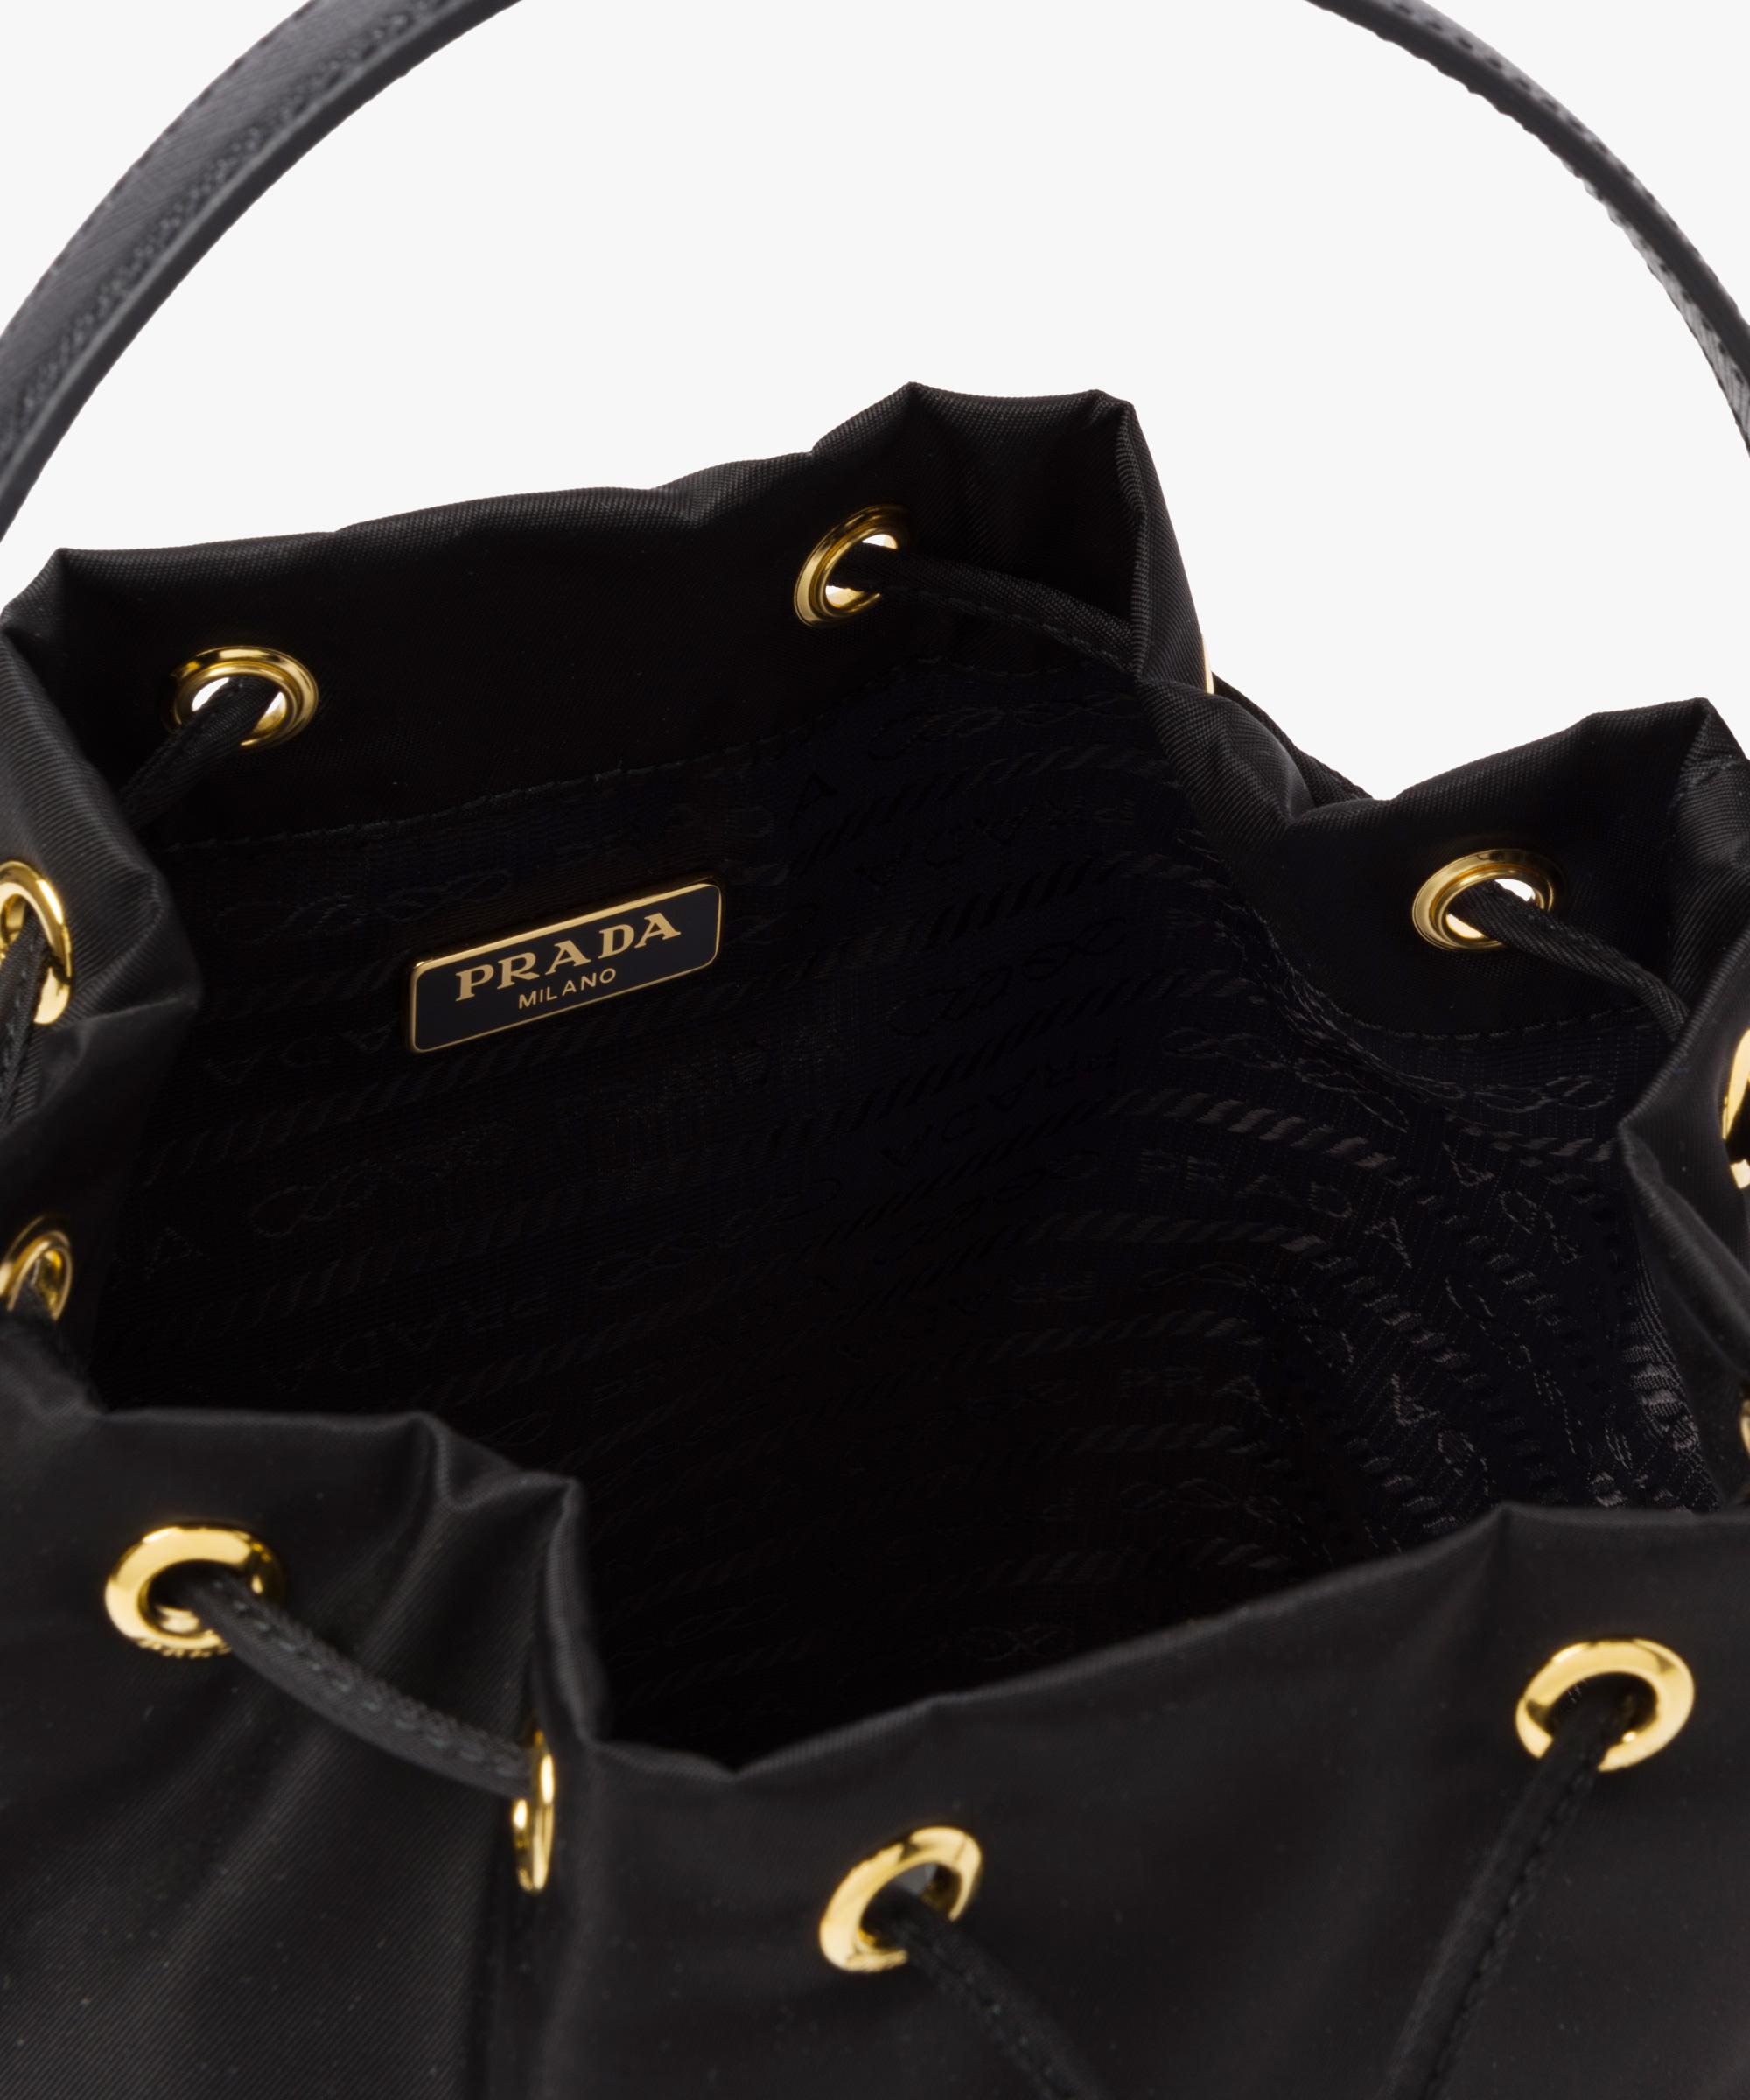 2dc527343c8fe3 ... new style lyst prada fabric mini bag in black 155b1 cbe0d ...